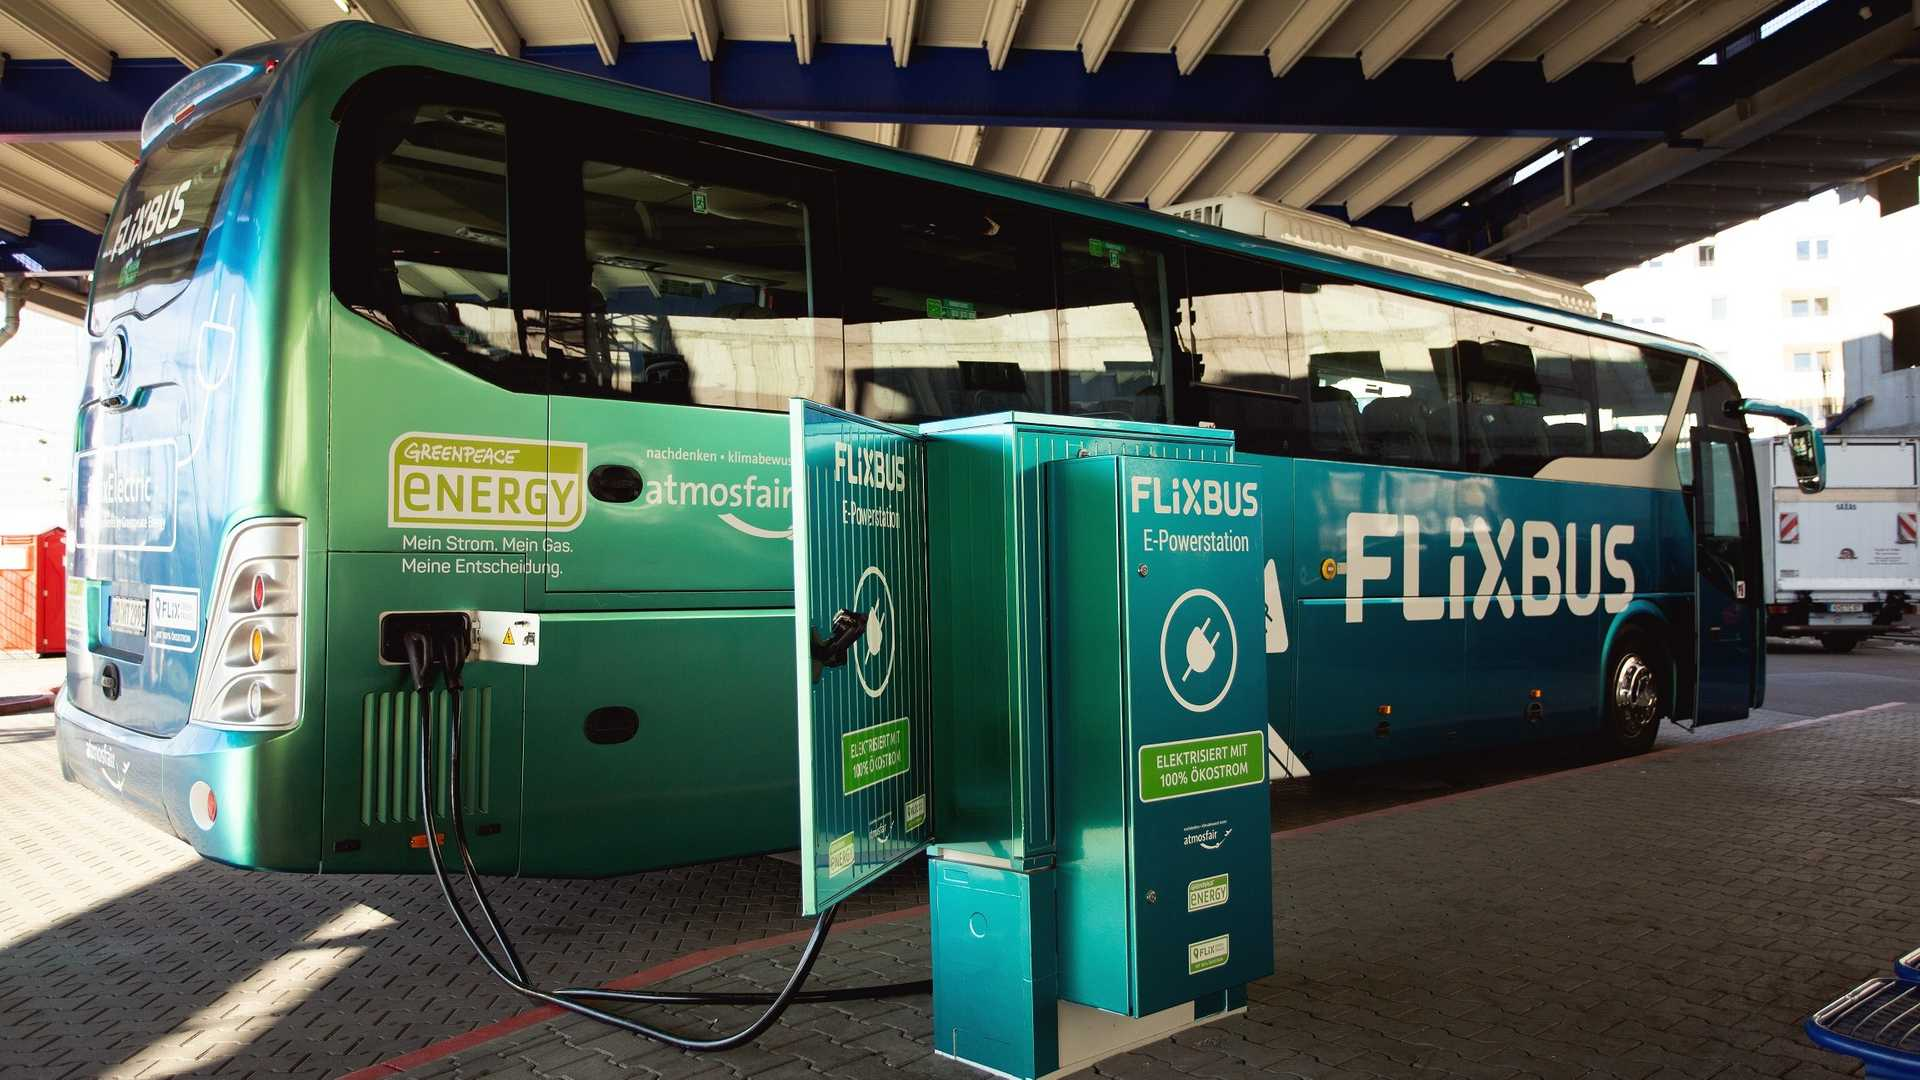 FlixBus, autobus a idrogeno insieme a Freudenberg